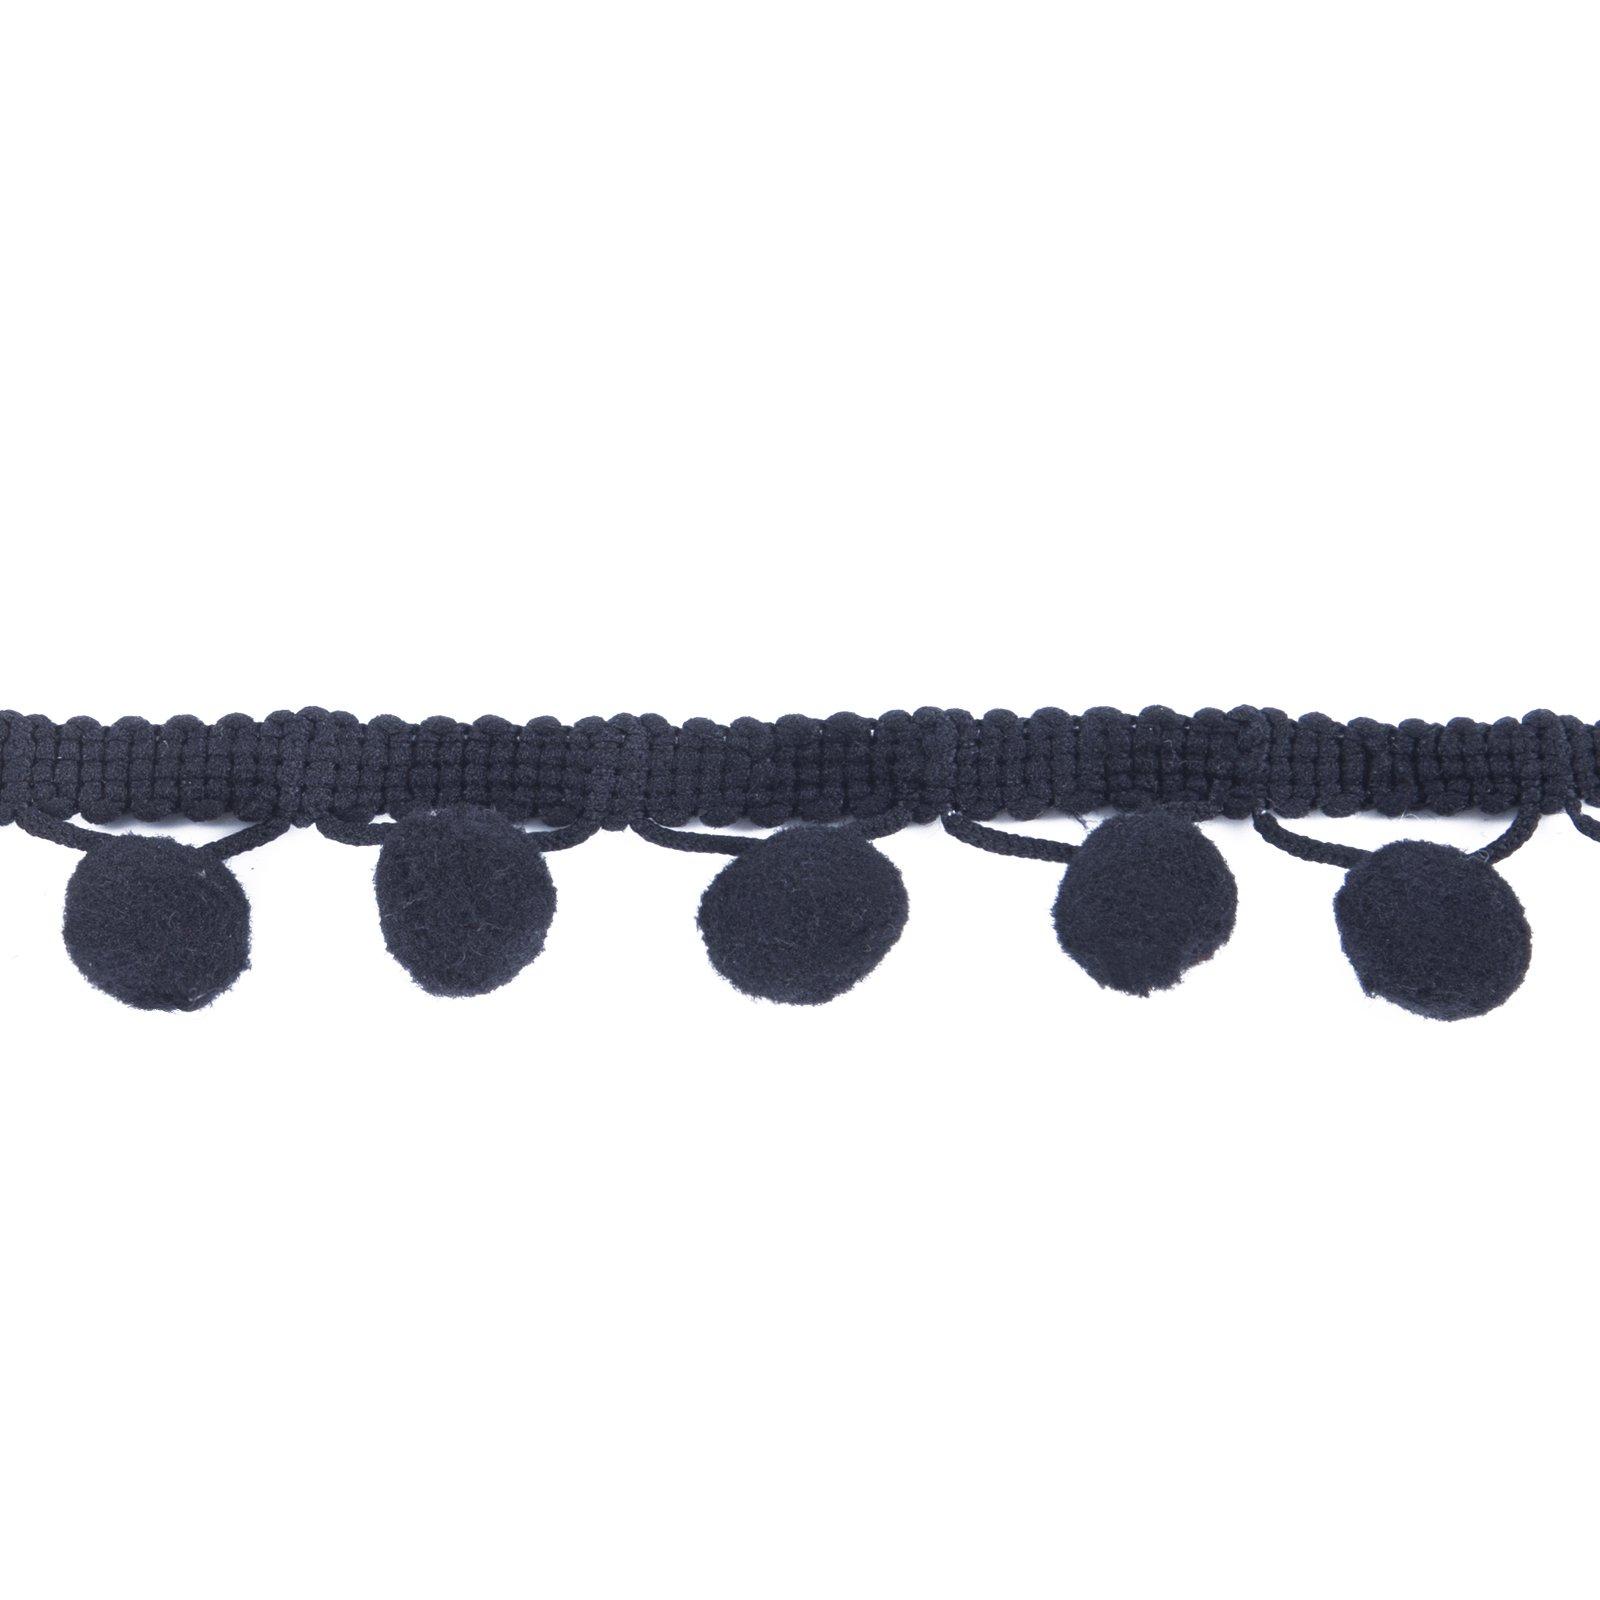 Pom Ball Size 12mm,Aqua XiXiboutique 18 Yards Ball Fringe Pom Pom Trim Ribbon Sewing